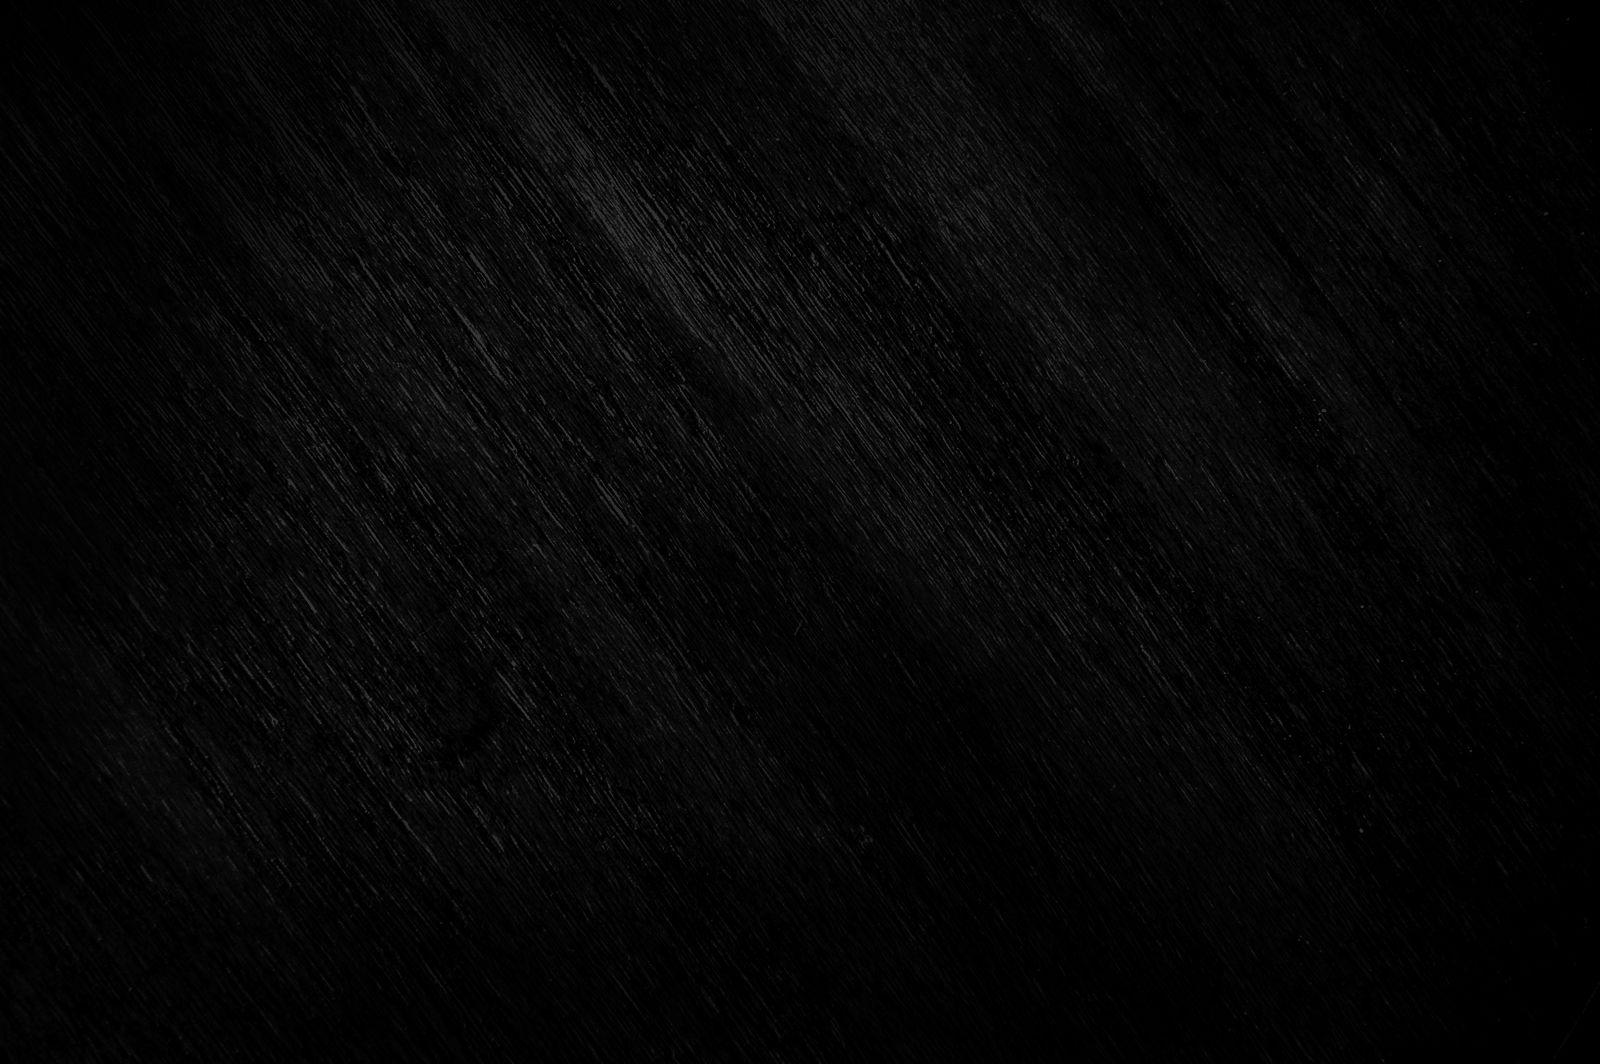 Black Backgrounds Photoshop Dark Pics Photoshop 23884wall ...